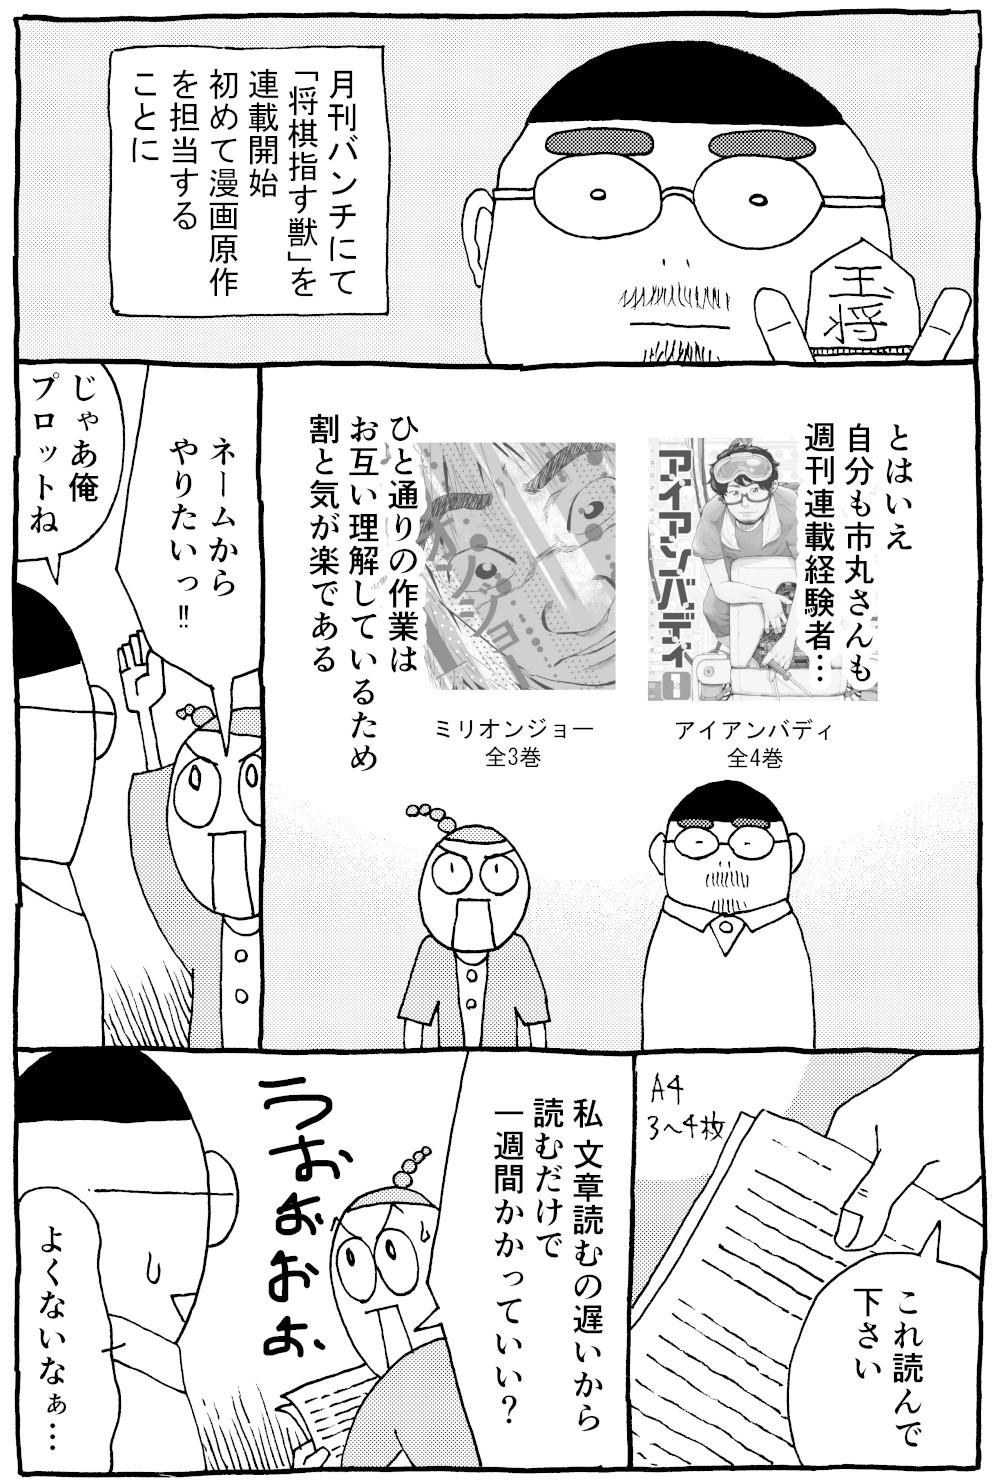 漫画原作者の仕事。|左藤真通|...